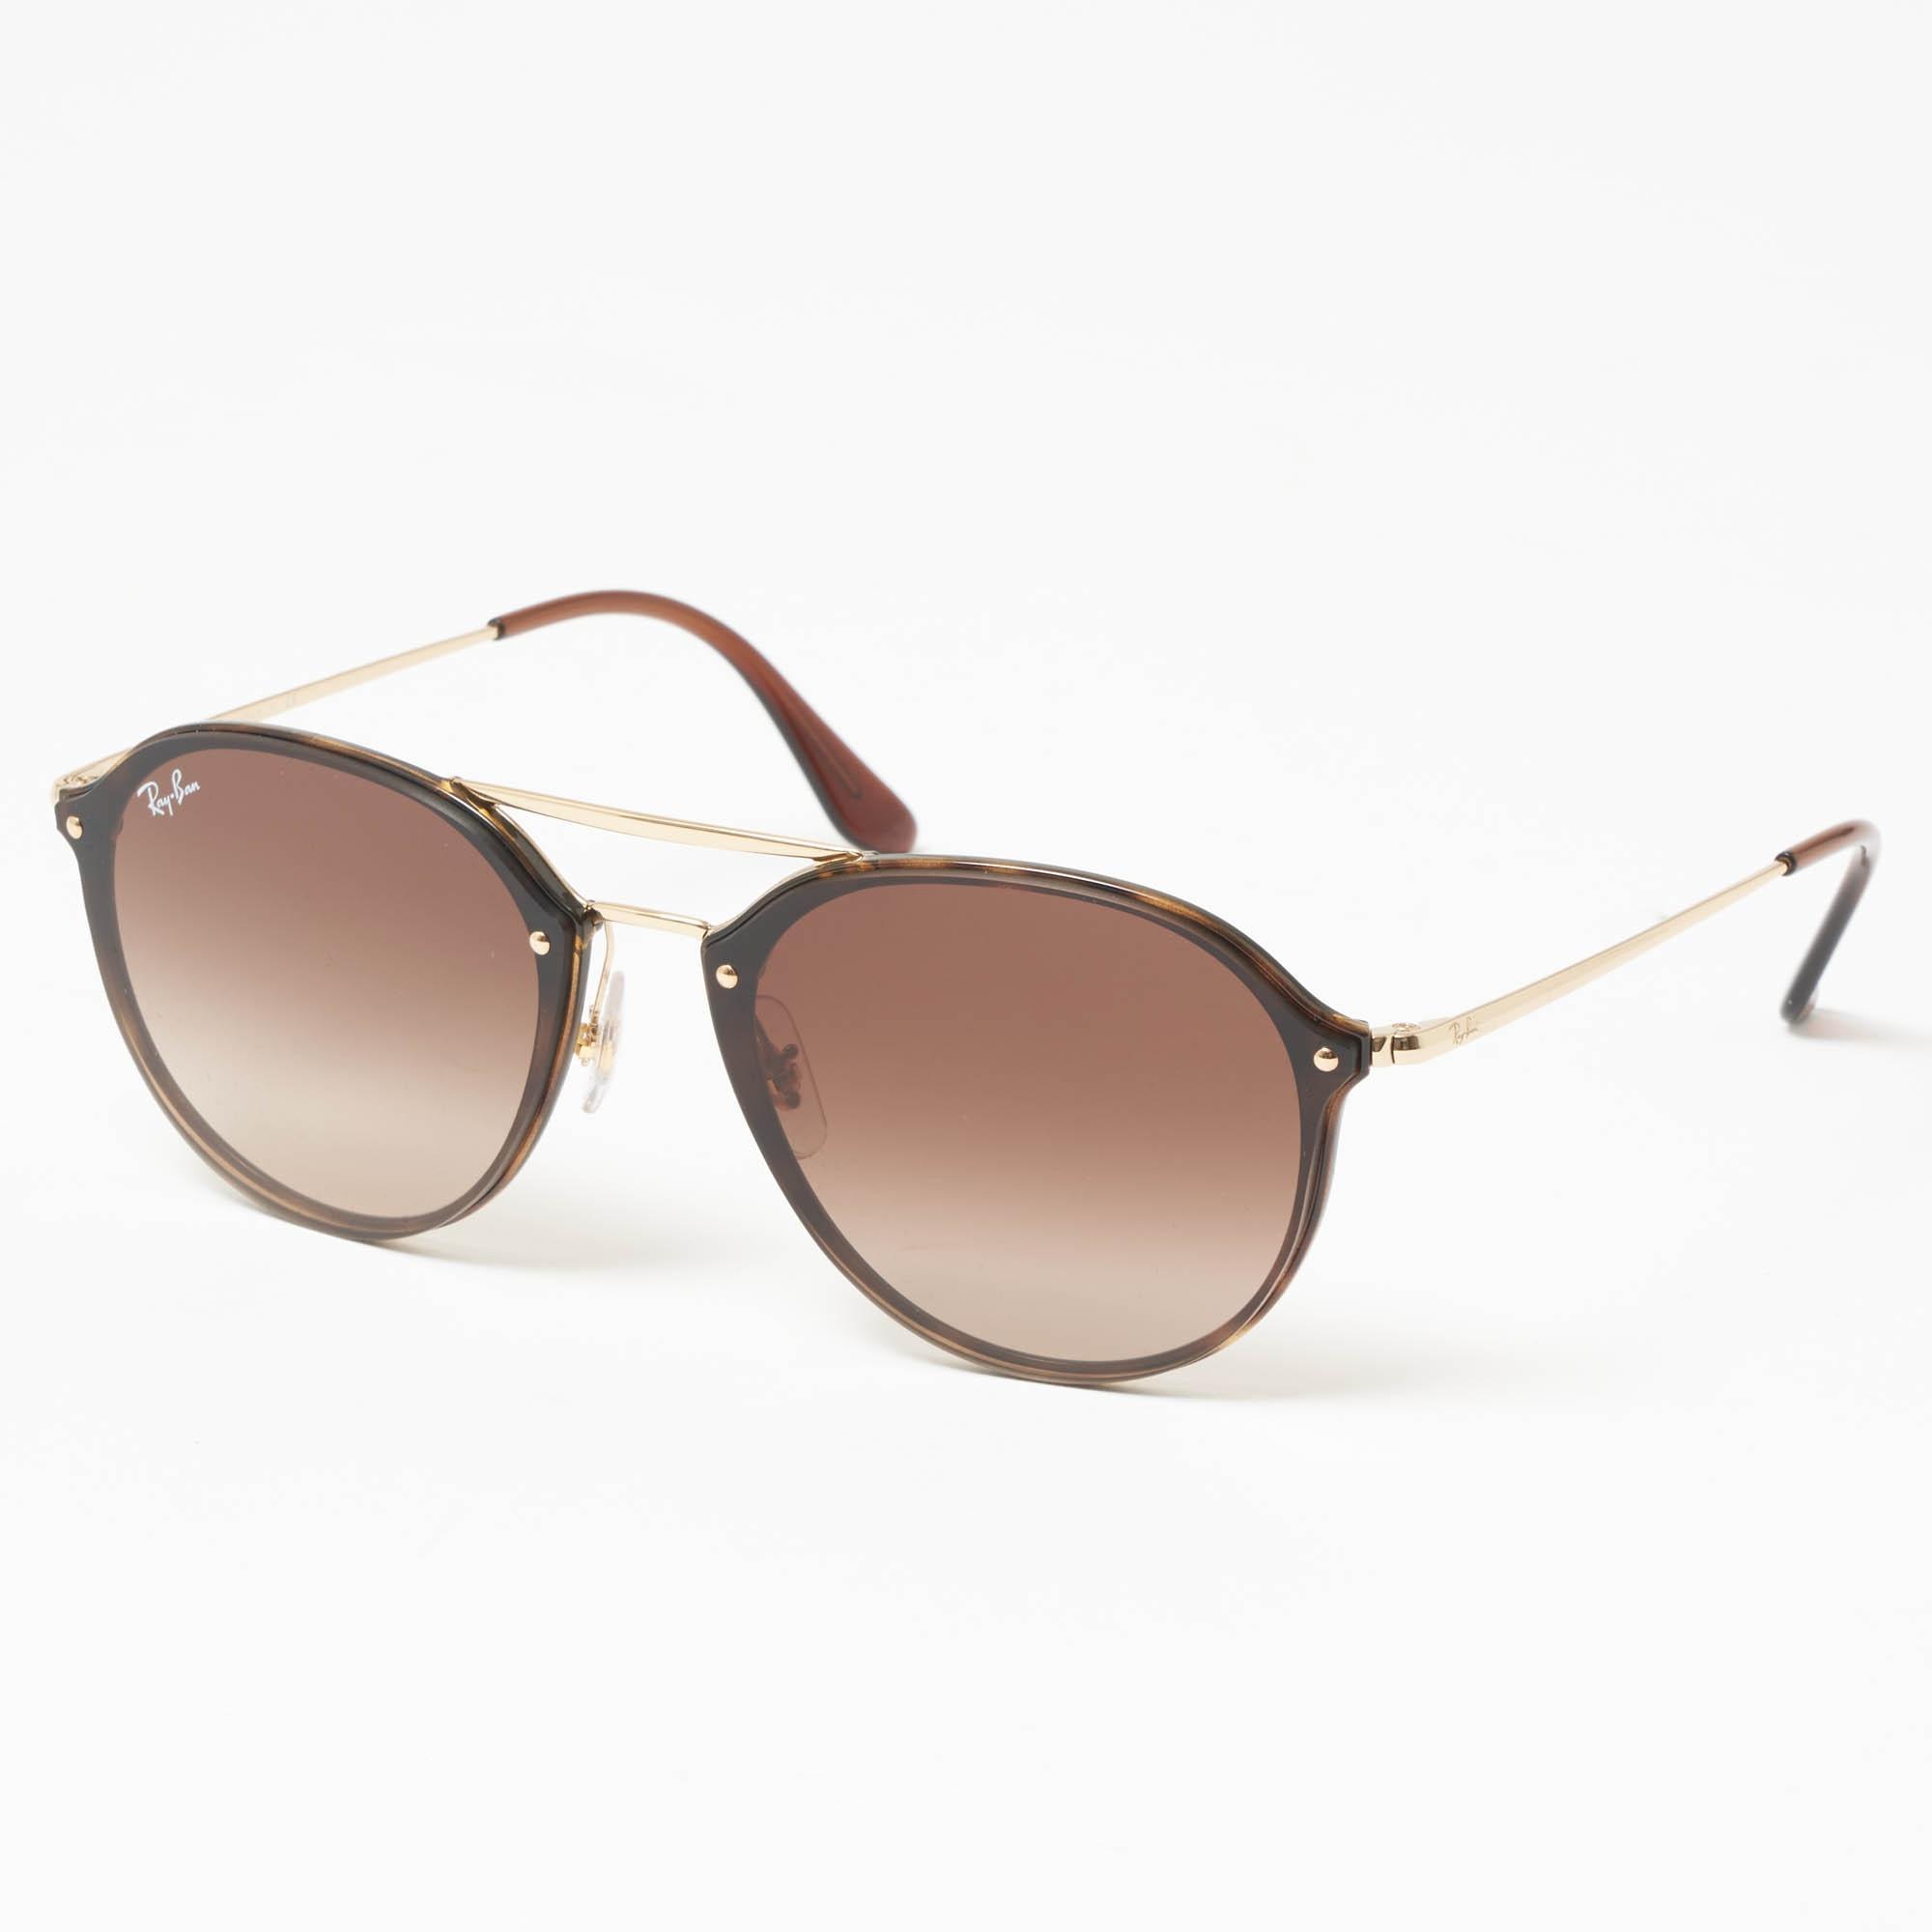 Ray-Ban Gold Blaze Double Bridge Sunglasses - Brown Gradient Lenses ... 709bb9598b1d